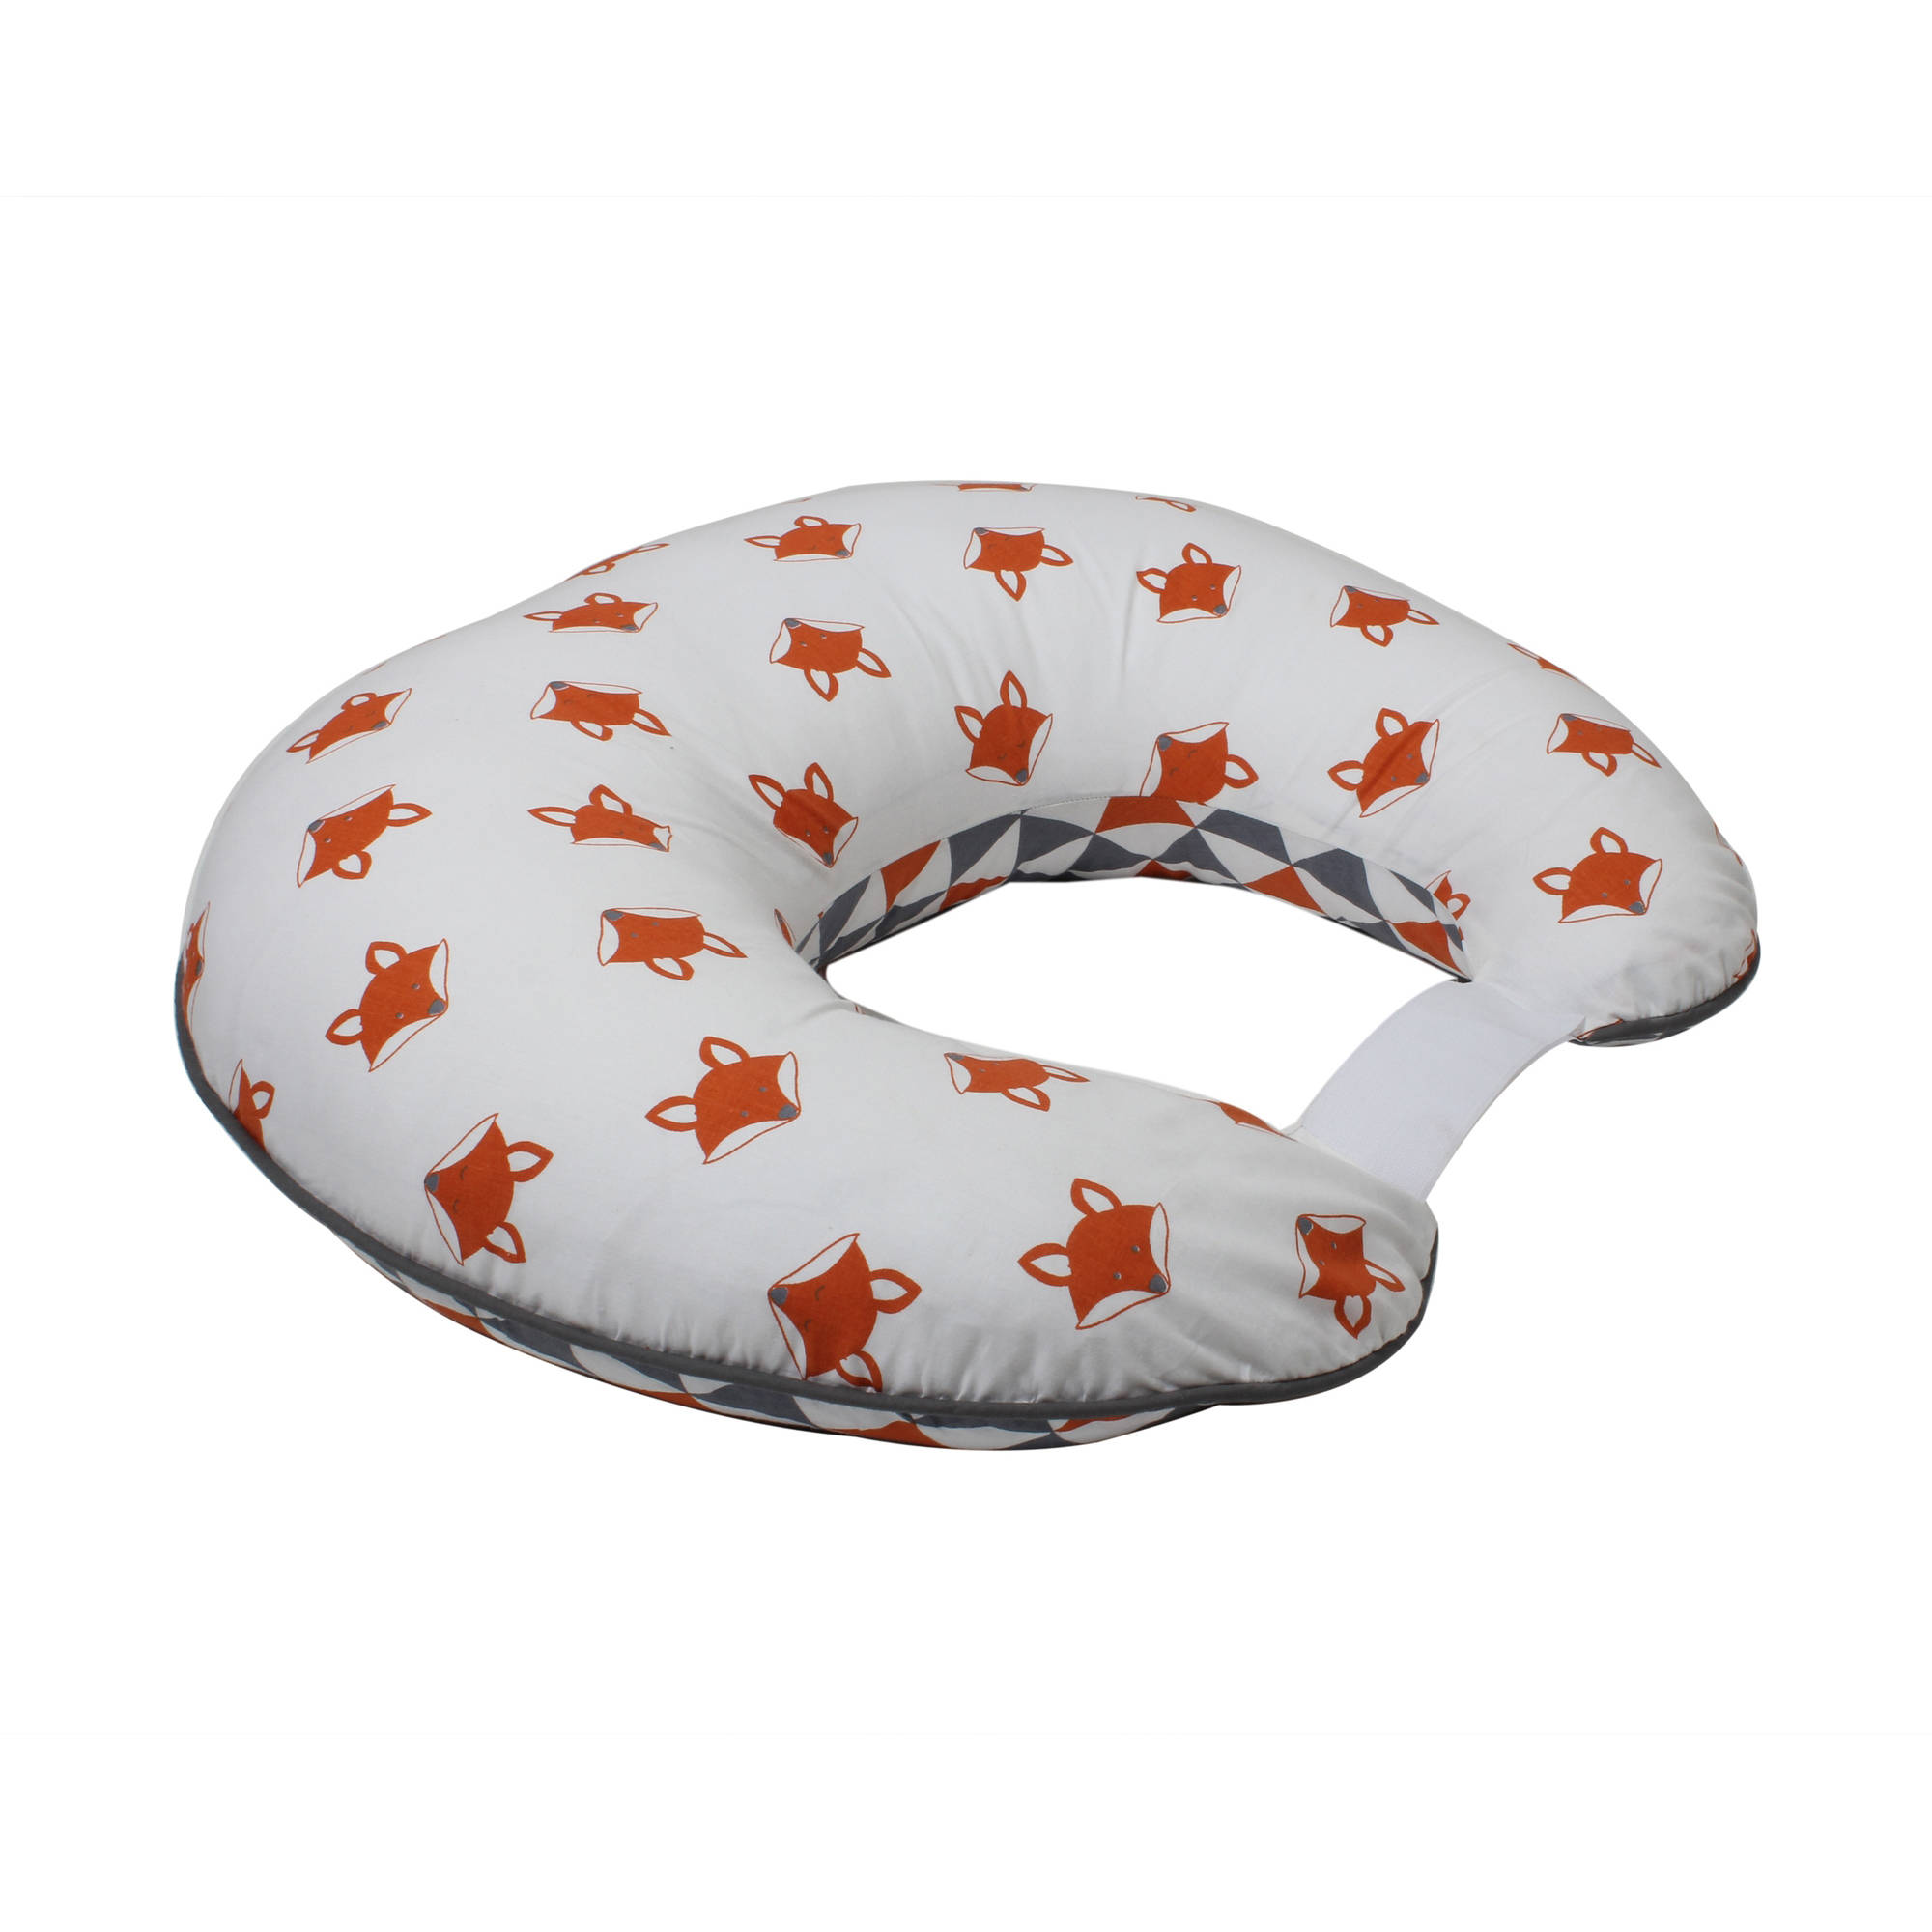 Bacati Playful Foxs Orange/Gray Nursing Pillow Cover